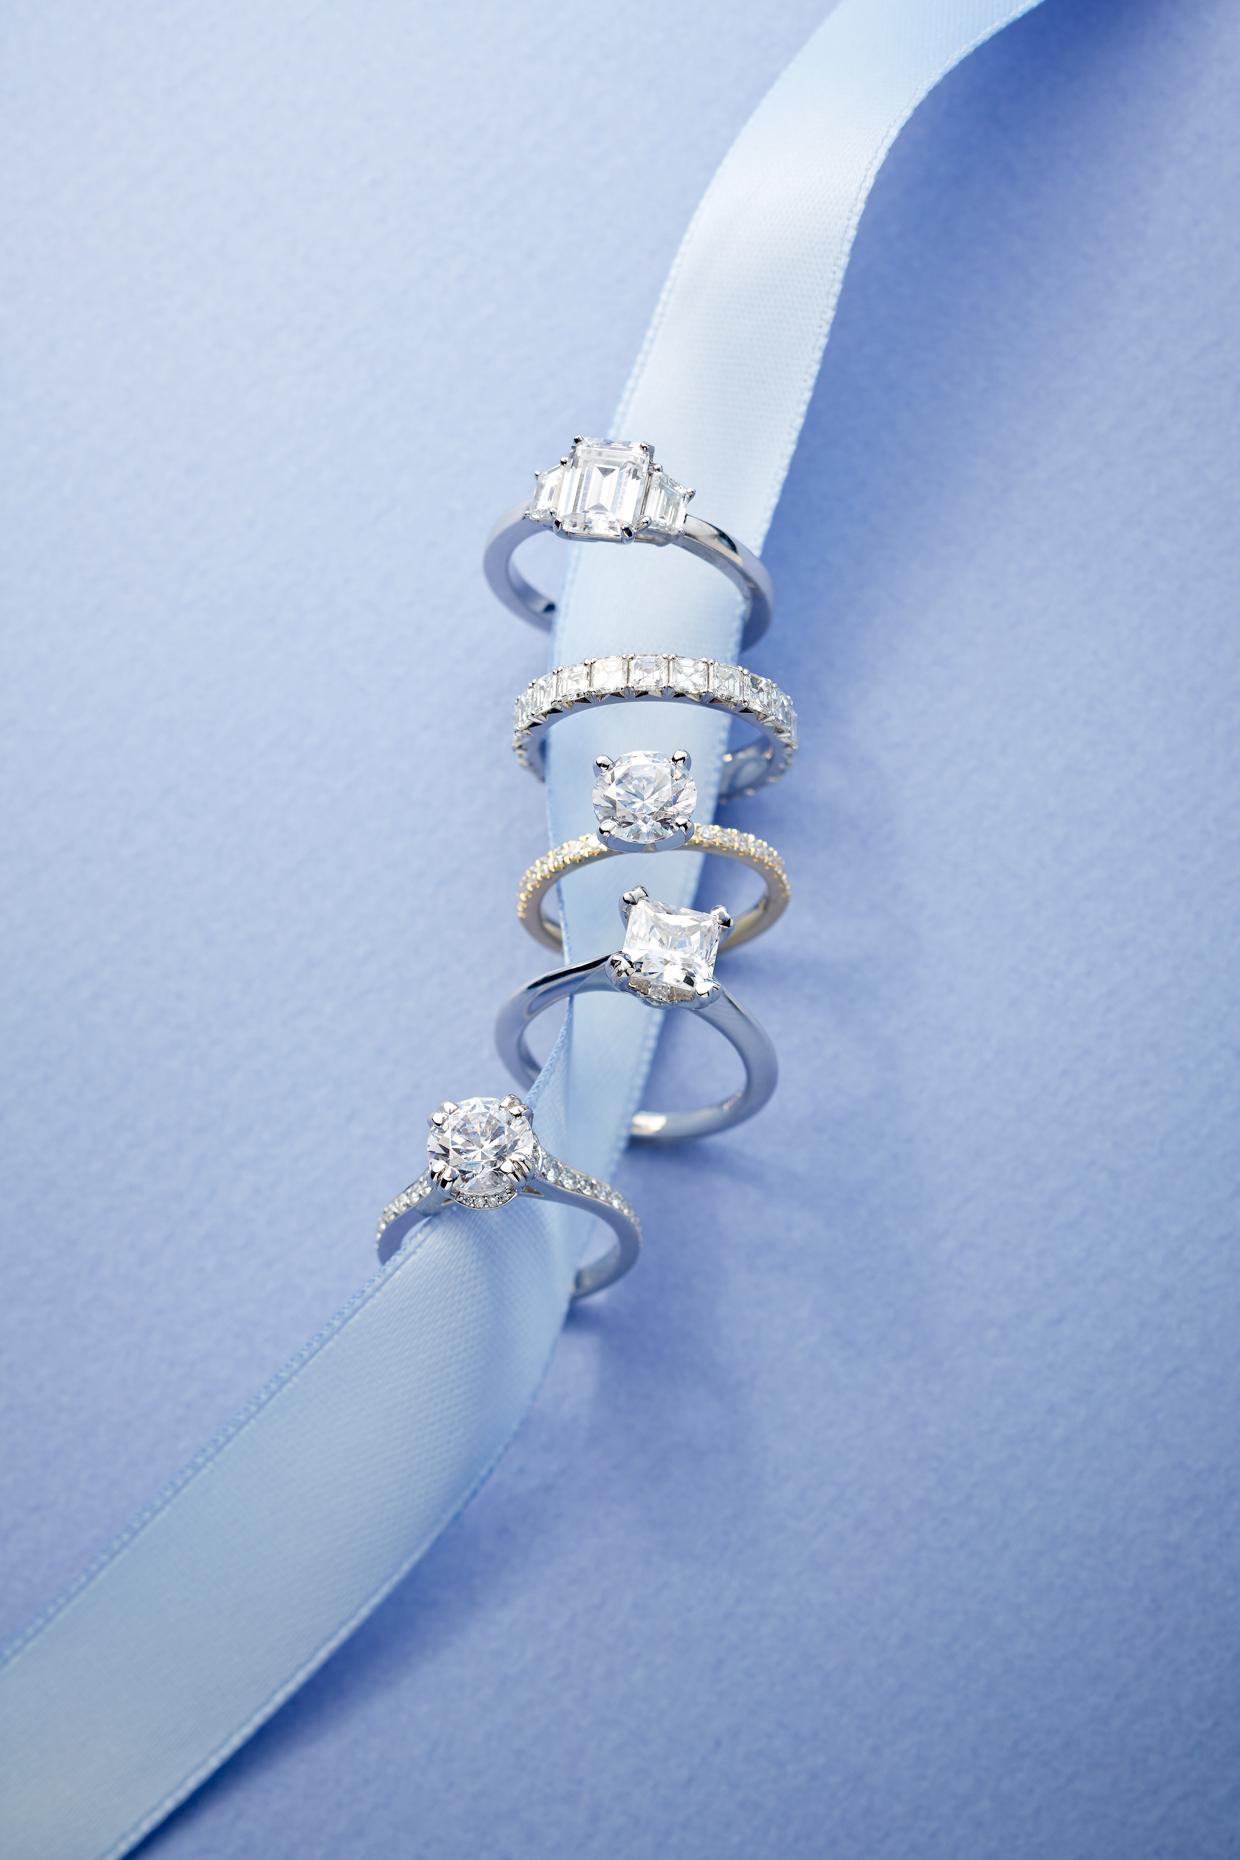 Product photography Jewelry Derek Israelsen Diamond Rings Ribbon